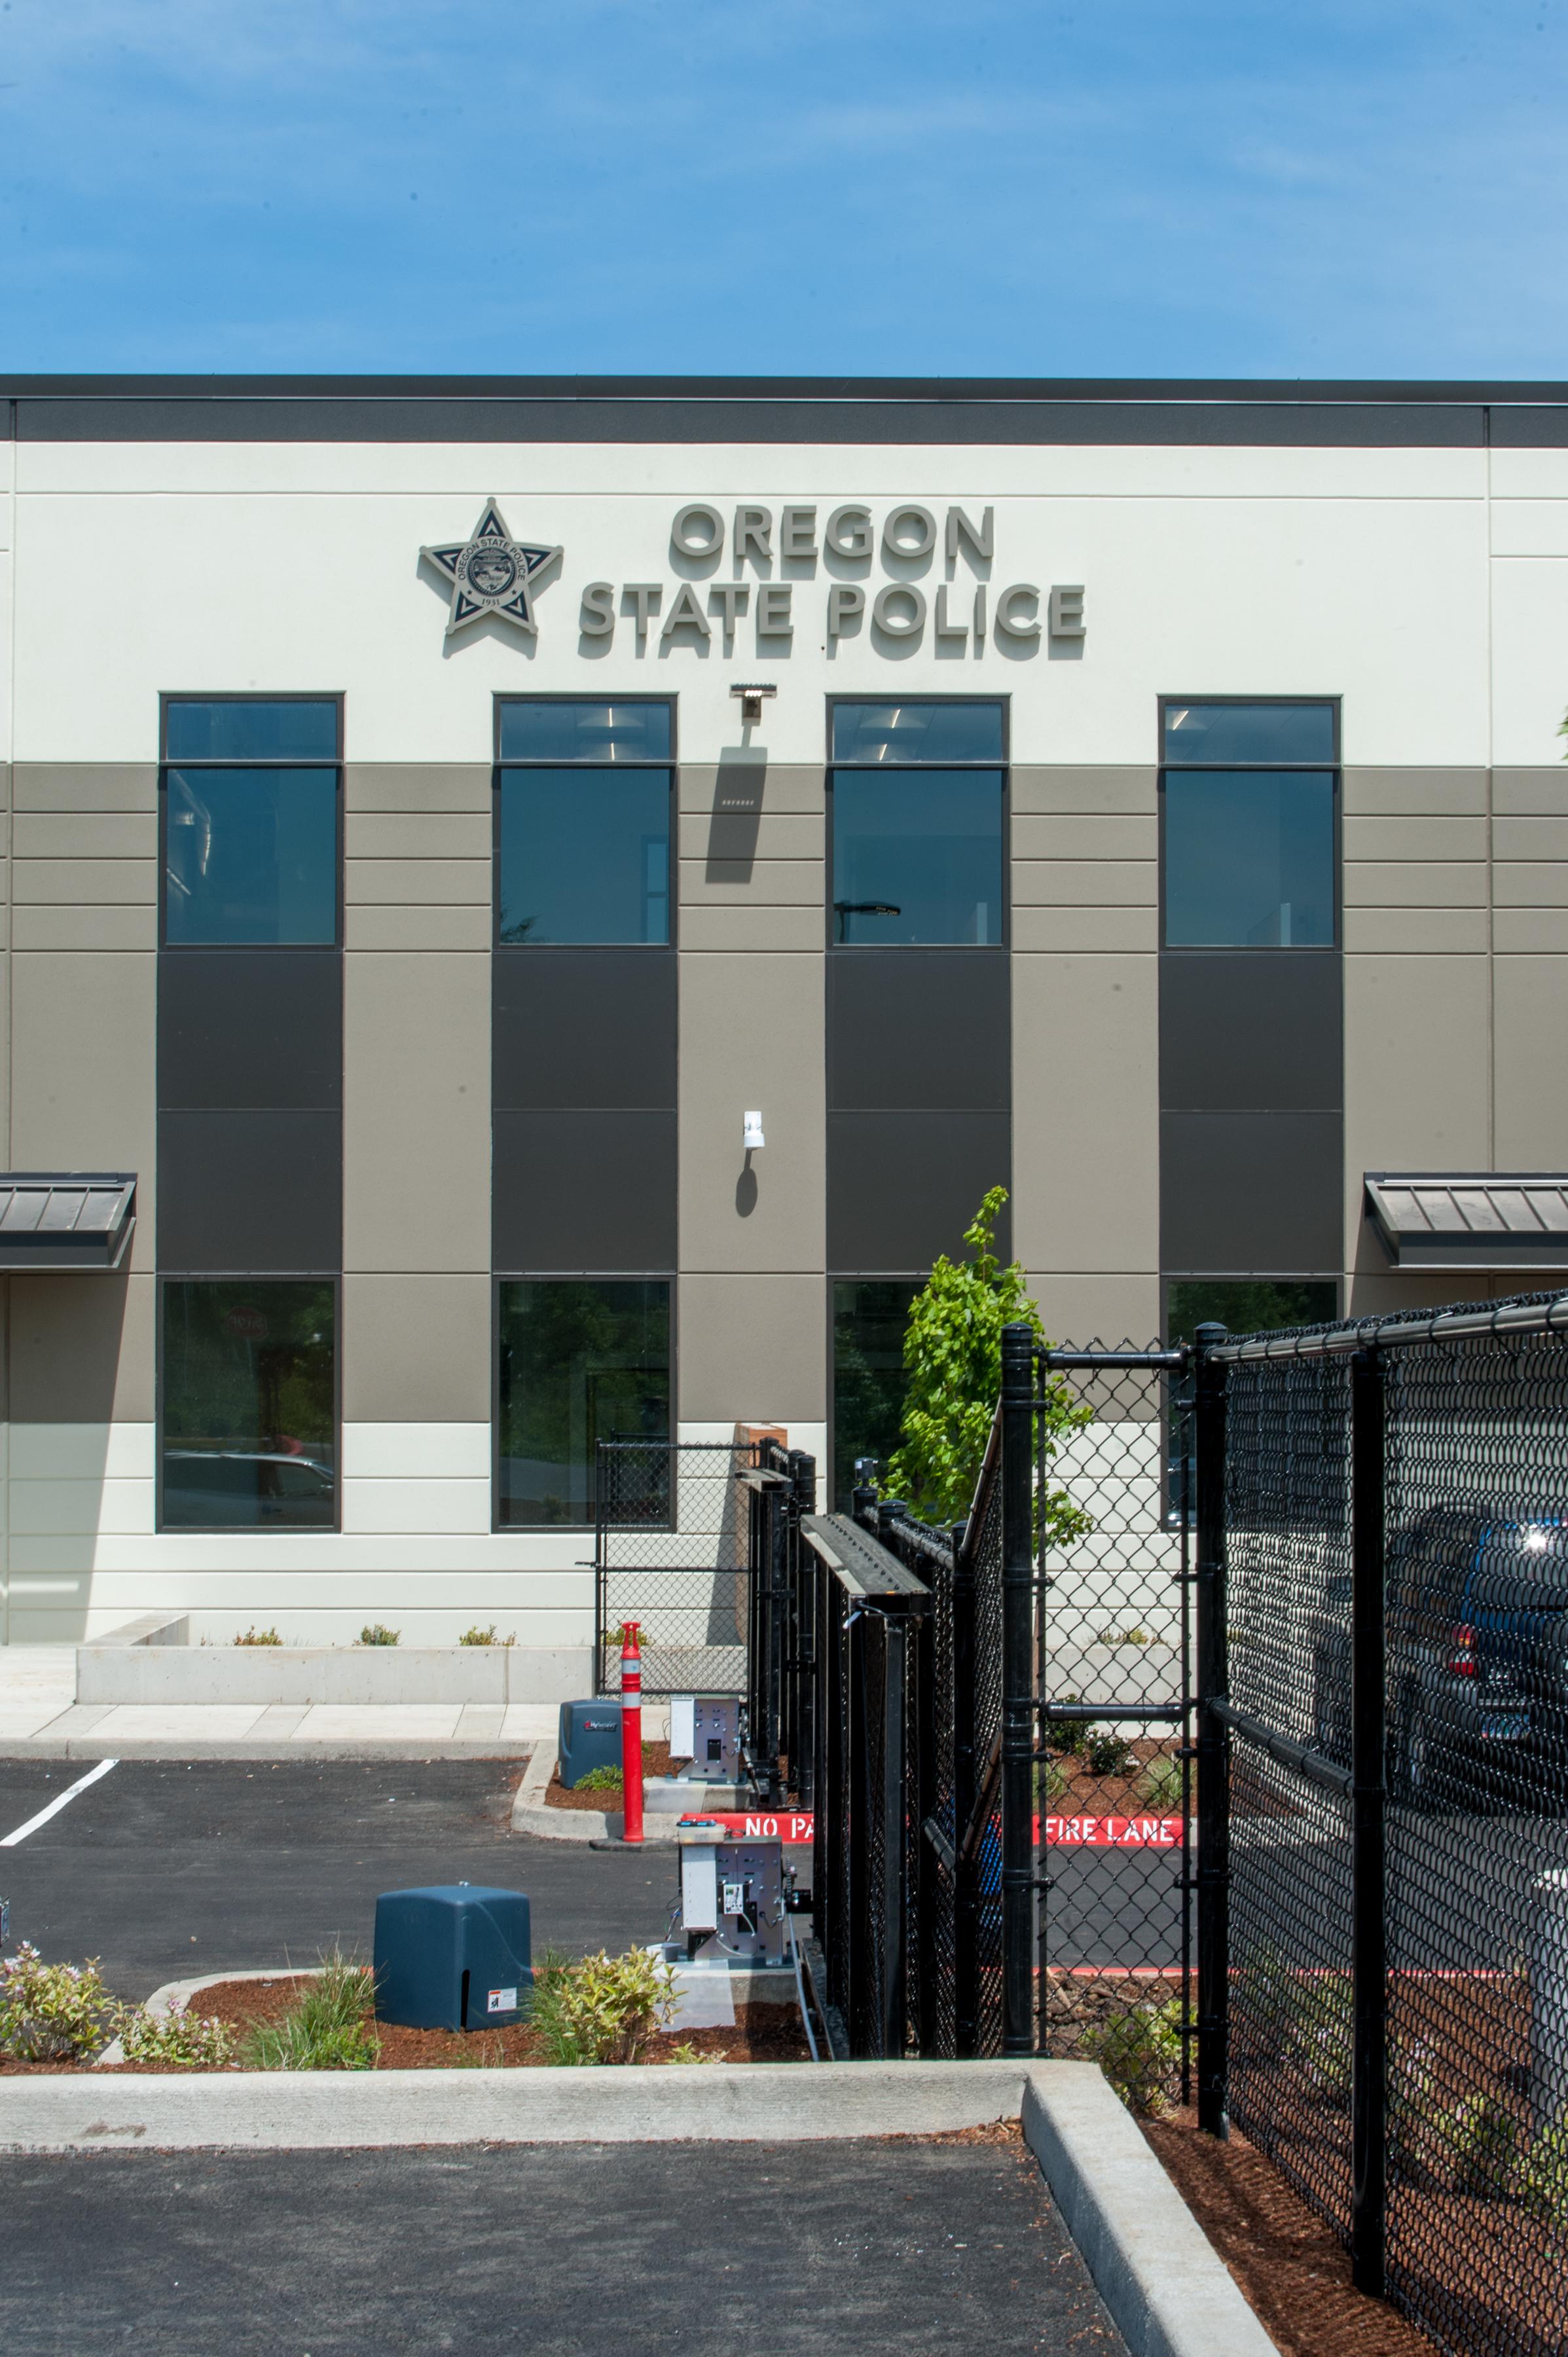 OregonStatePolice-byDiegoGDiaz-25.jpg